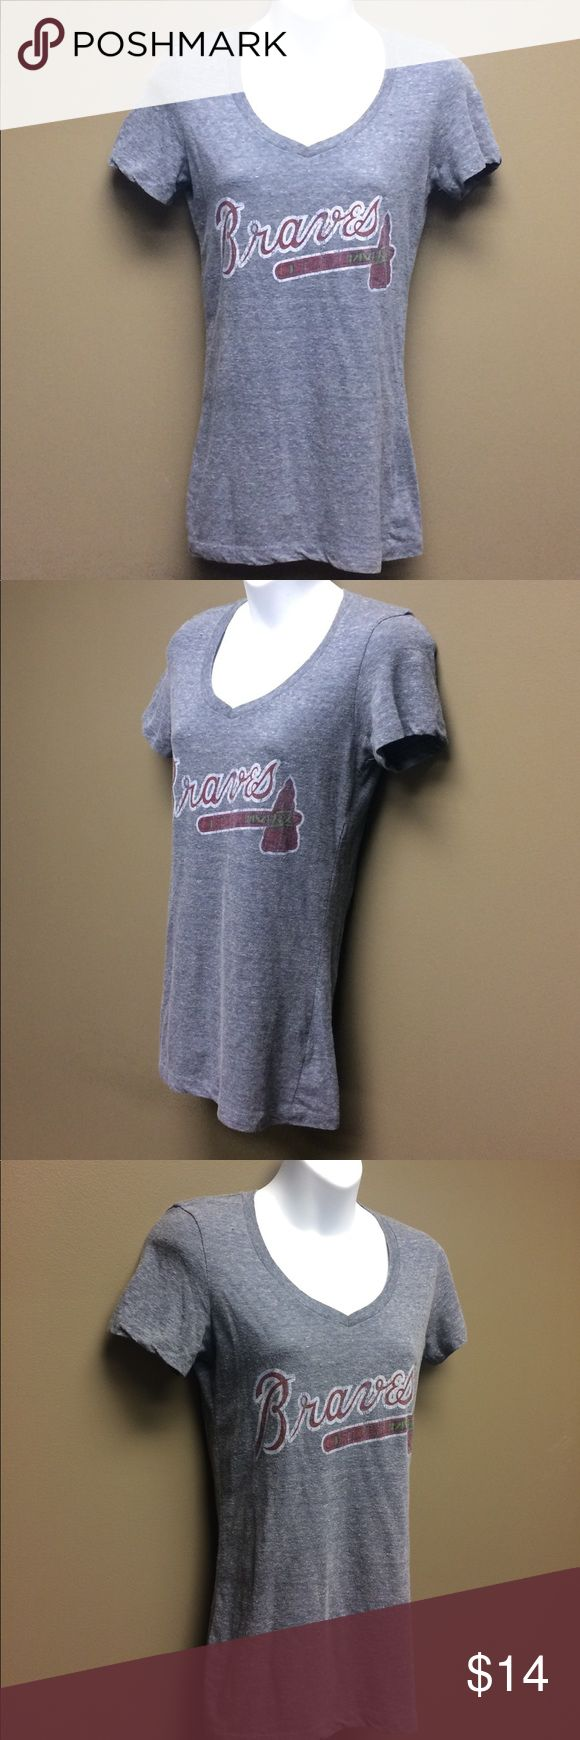 Atlanta Braves Heather Grey V Neck Tee Shirt, M Atlanta Braves Heather Grey V Neck Tee Shirt, M Tops Tees - Short Sleeve